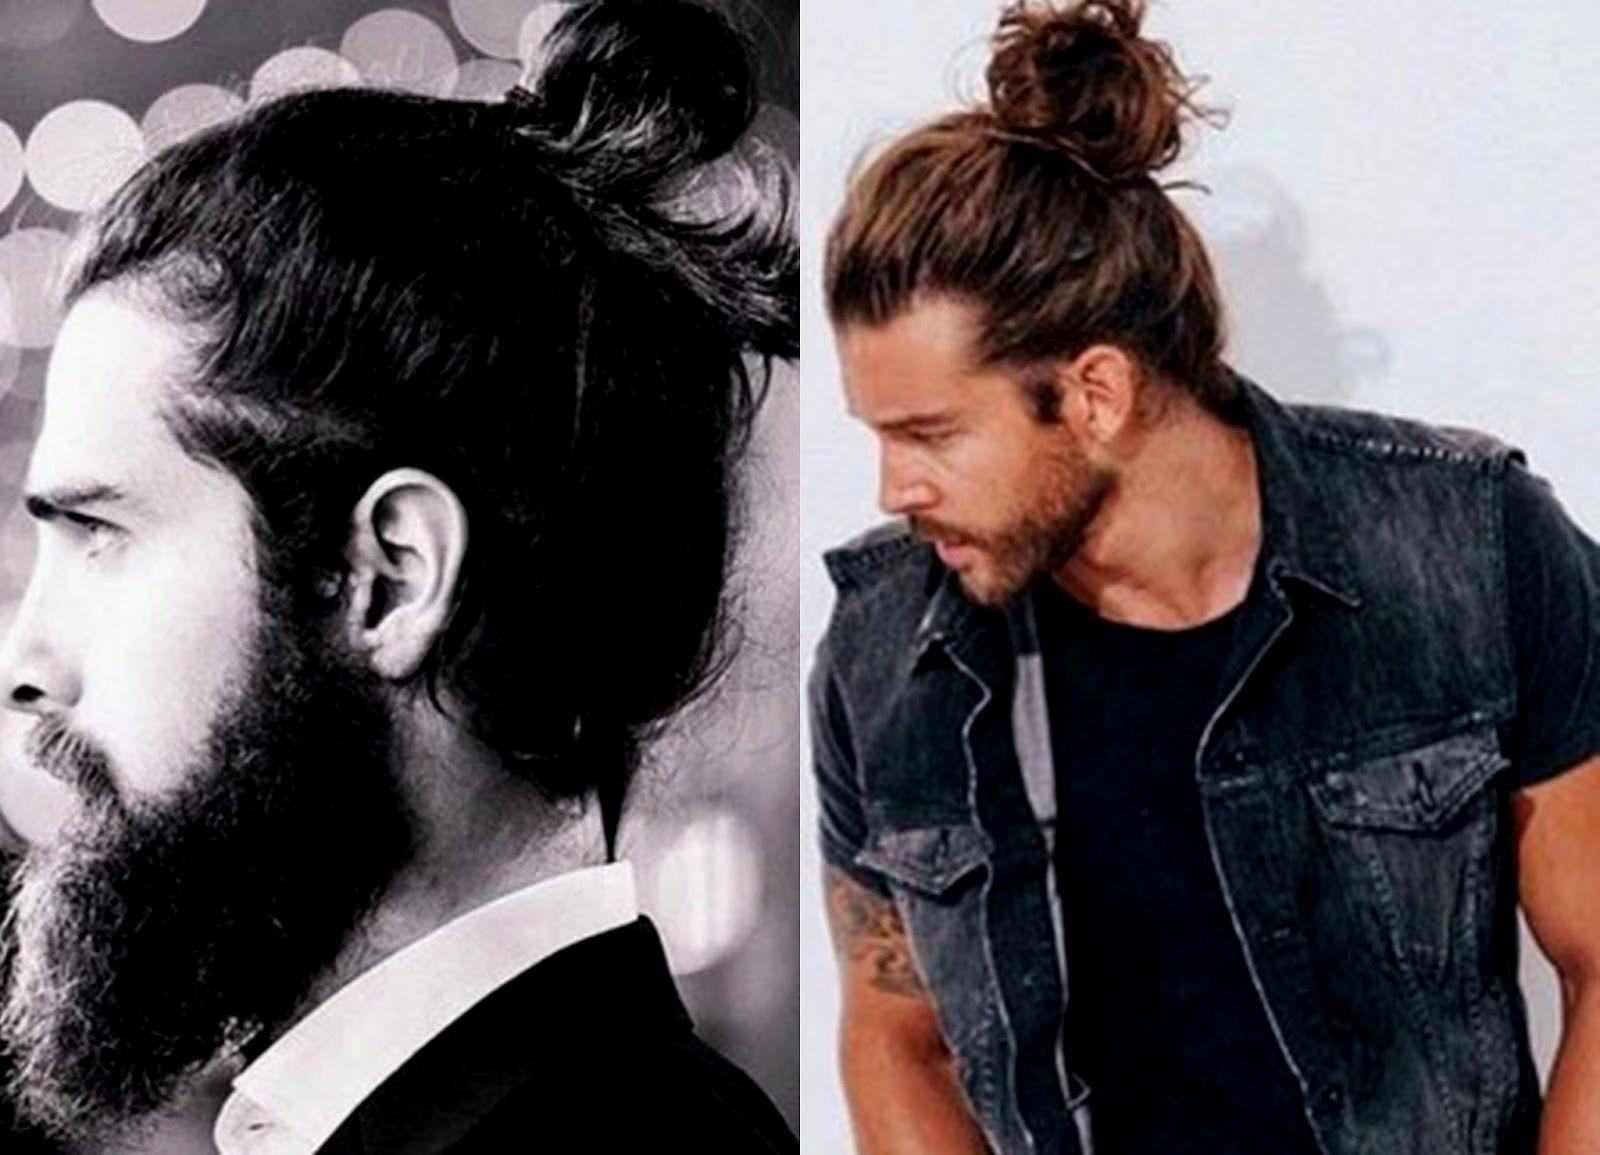 Ótimo corte cabelo masculino longo inspiração-New Corte Cabelo Masculino Longo Foto